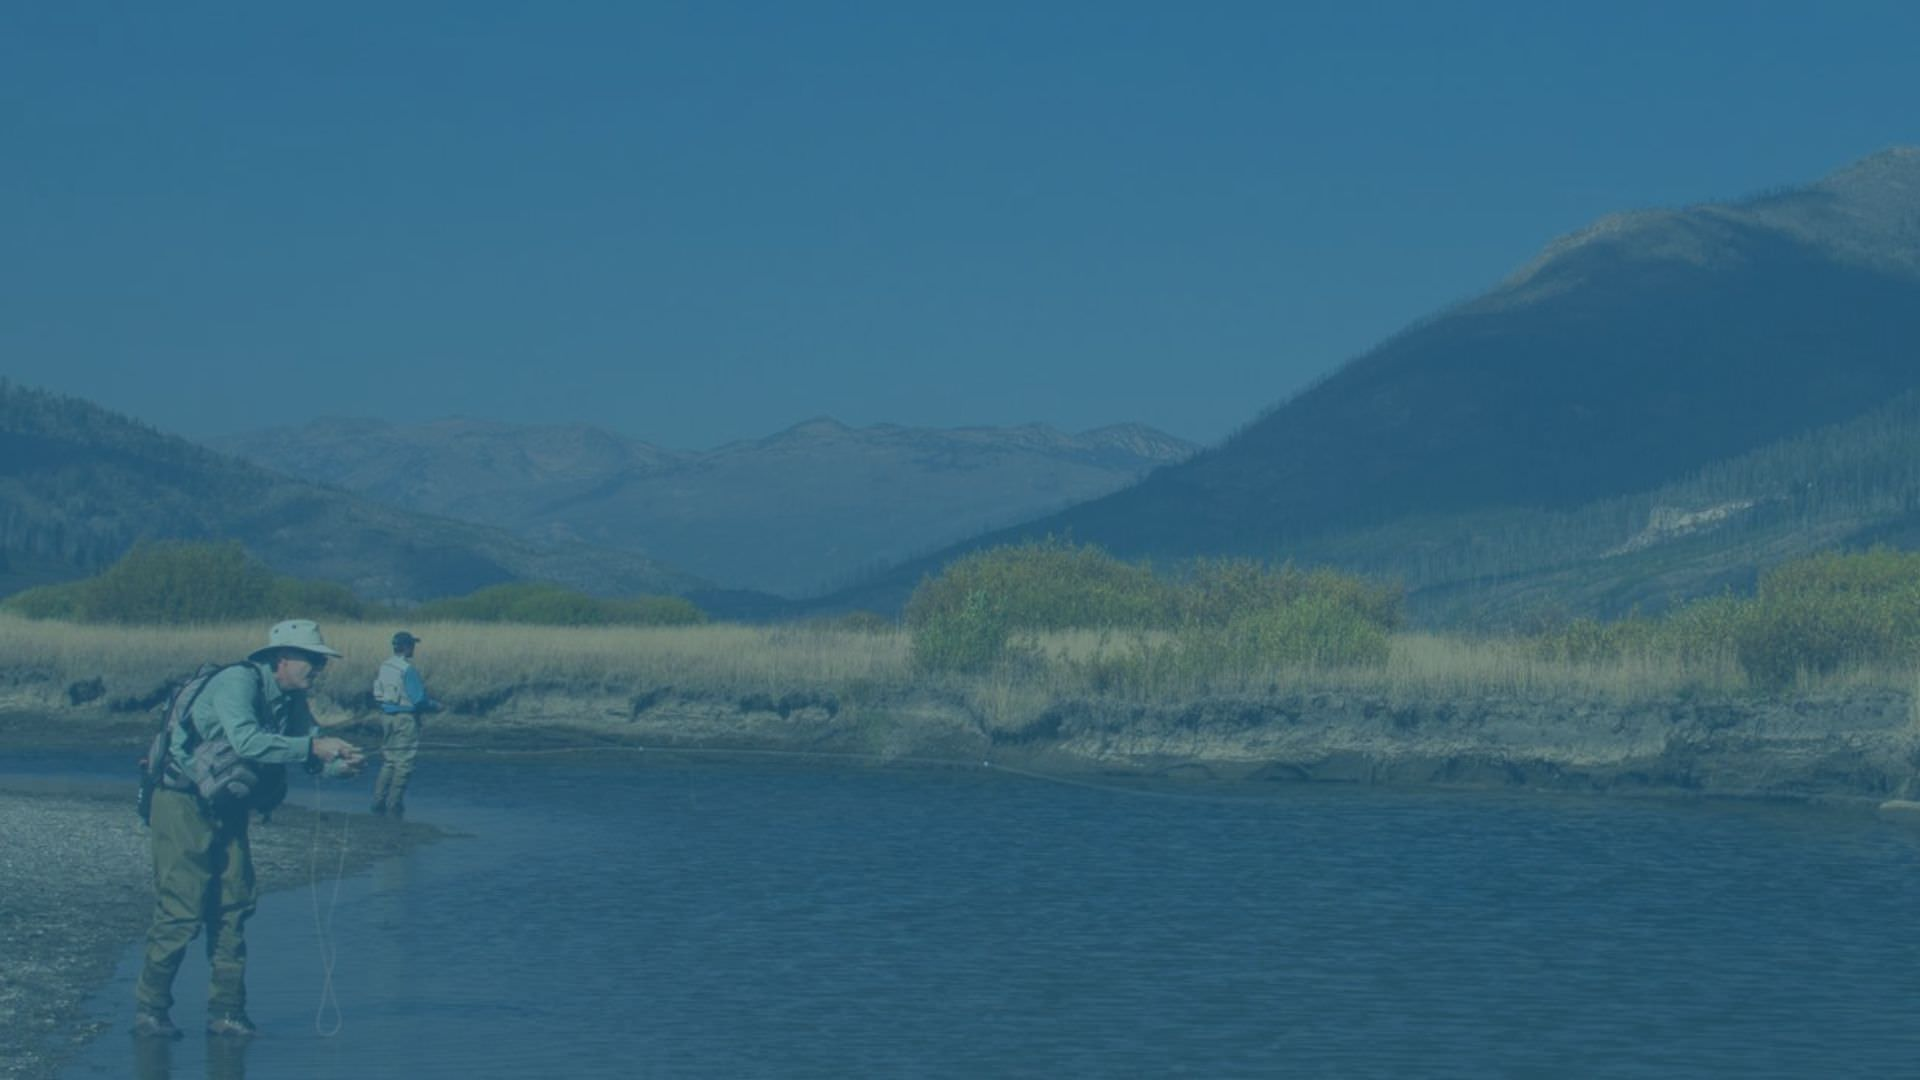 Horseback Ride to Fish Adventures Yellowstone